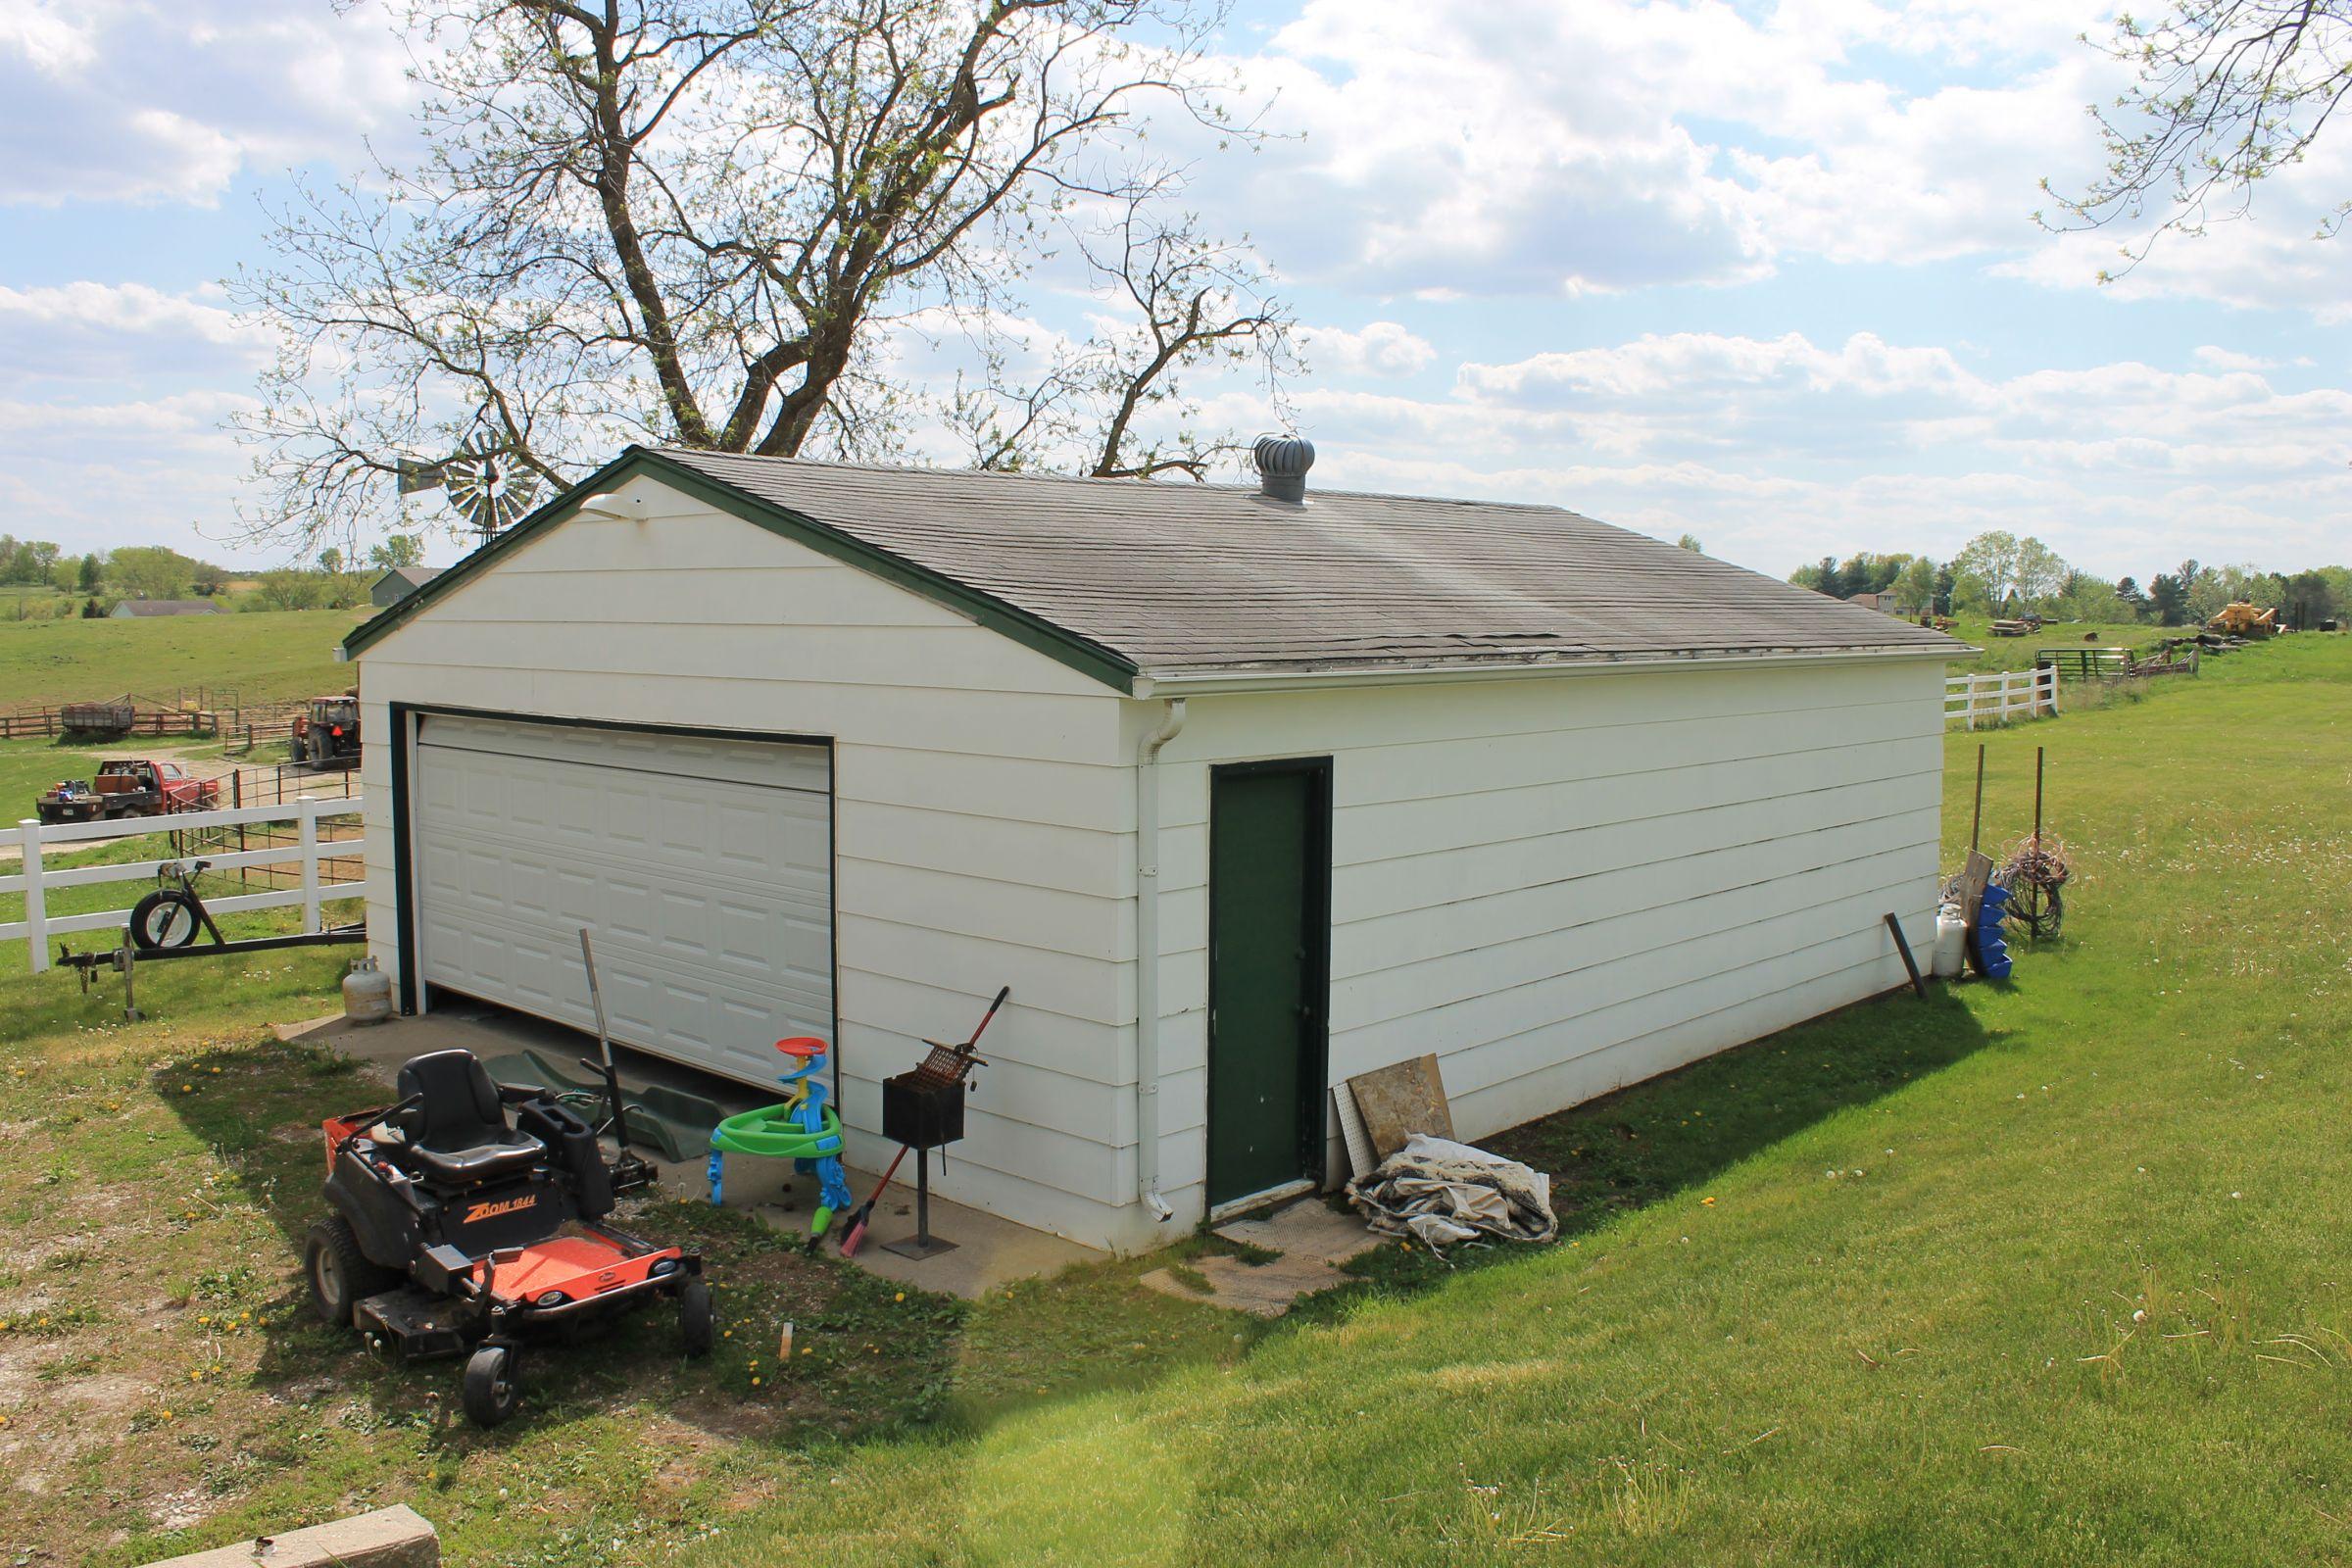 residential-development-land-warren-county-iowa-38-acres-listing-number-15513-11-2021-05-06-210444.JPG